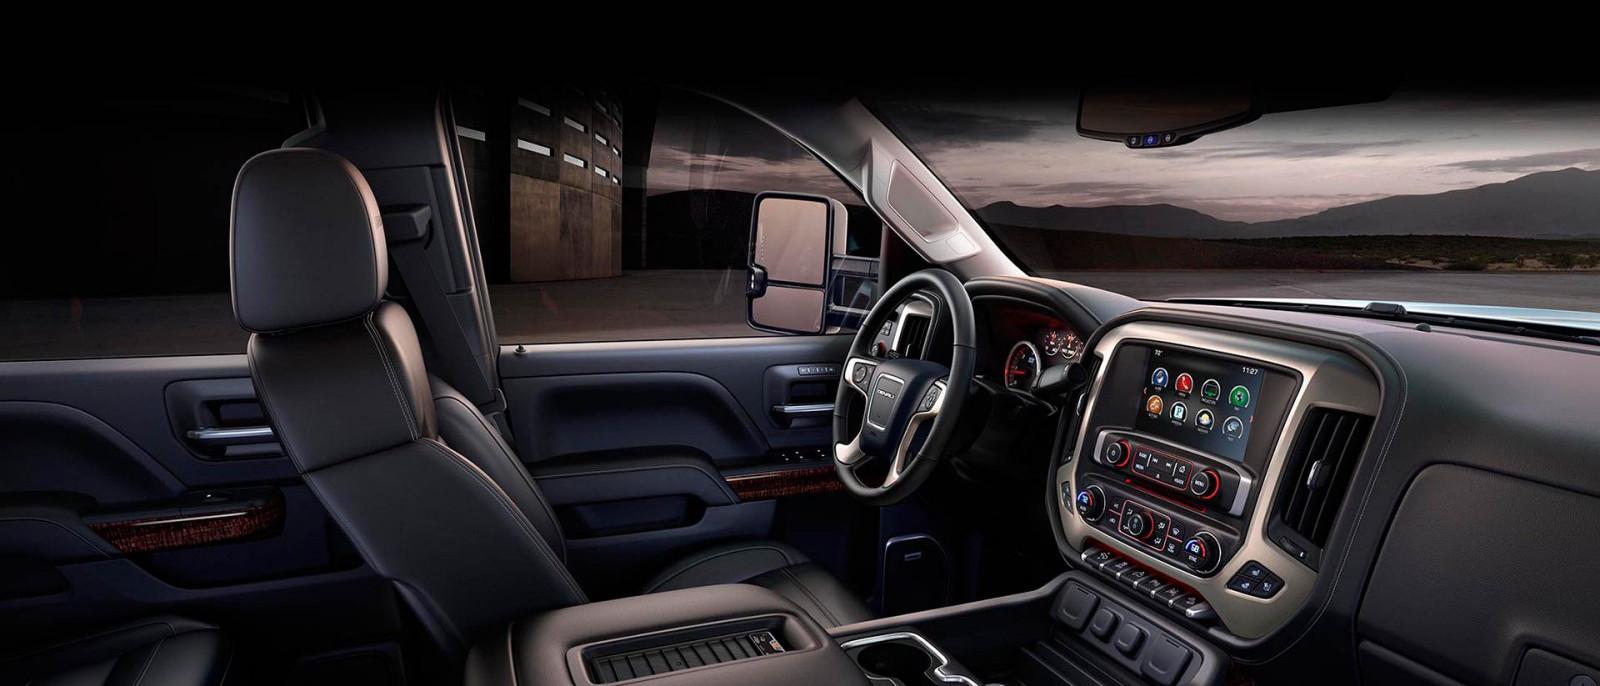 2016 Sierra 3500HD Interior